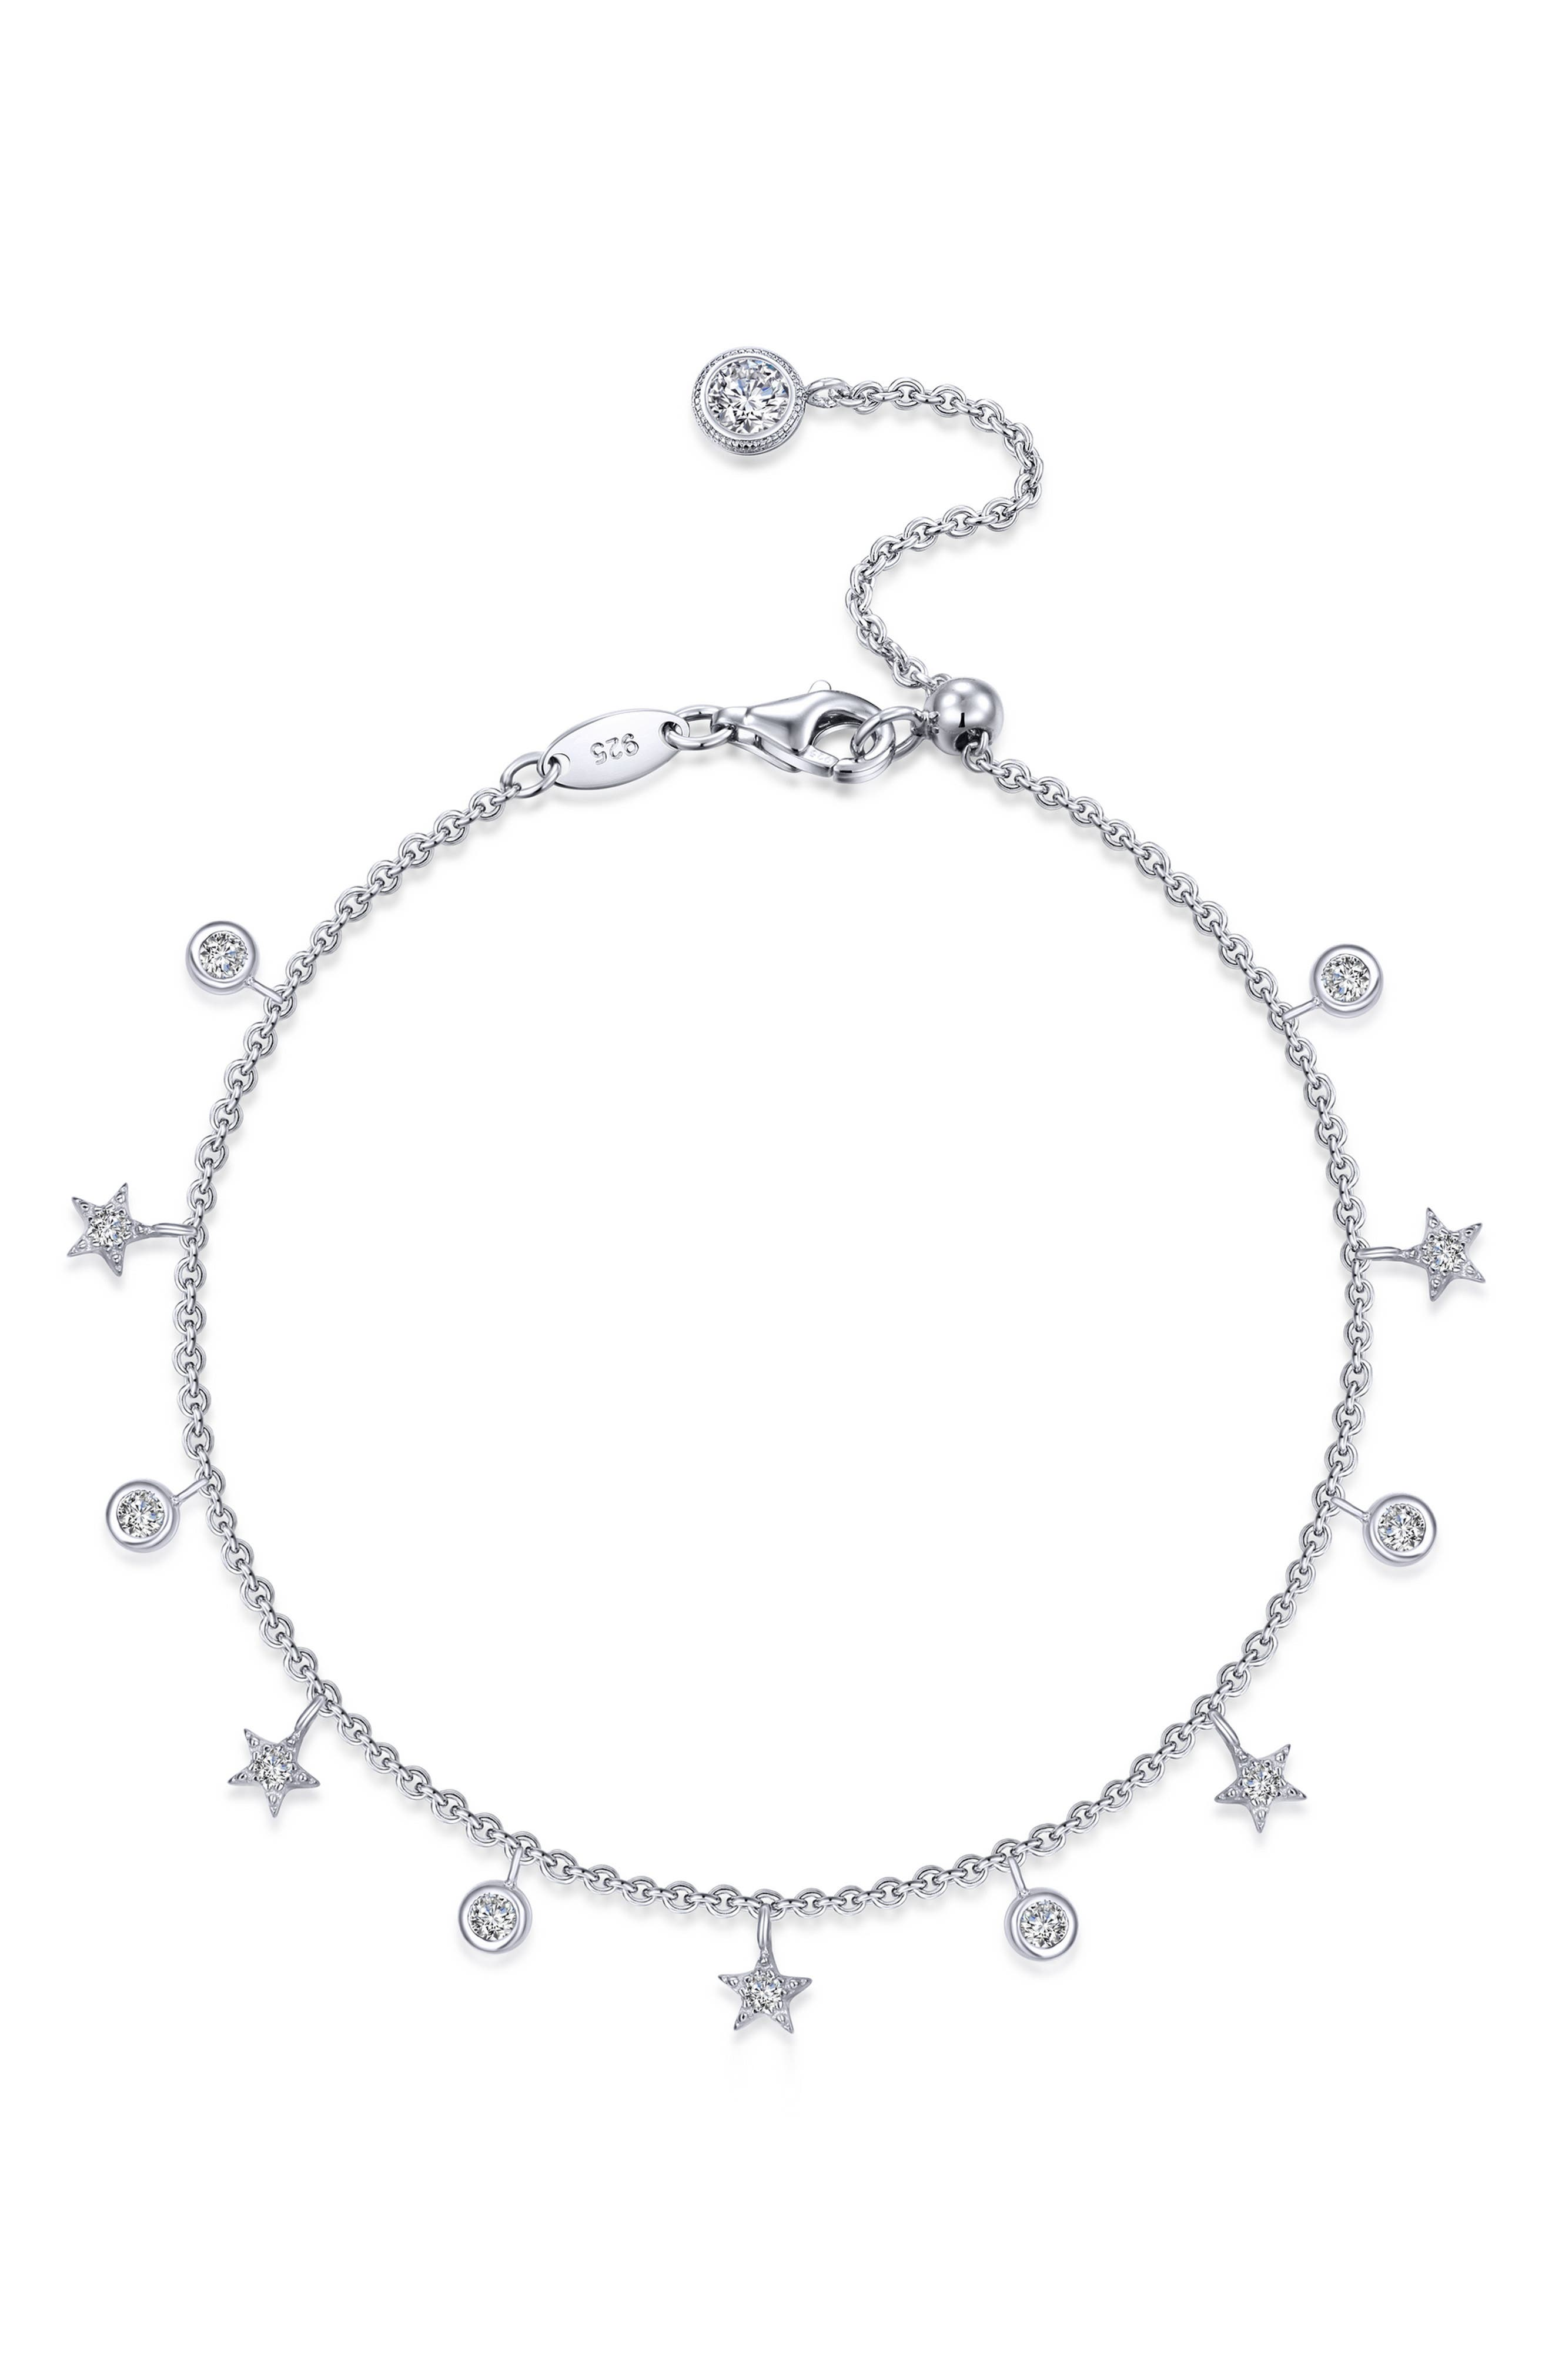 Starfall Simulated Diamond Charm Bracelet